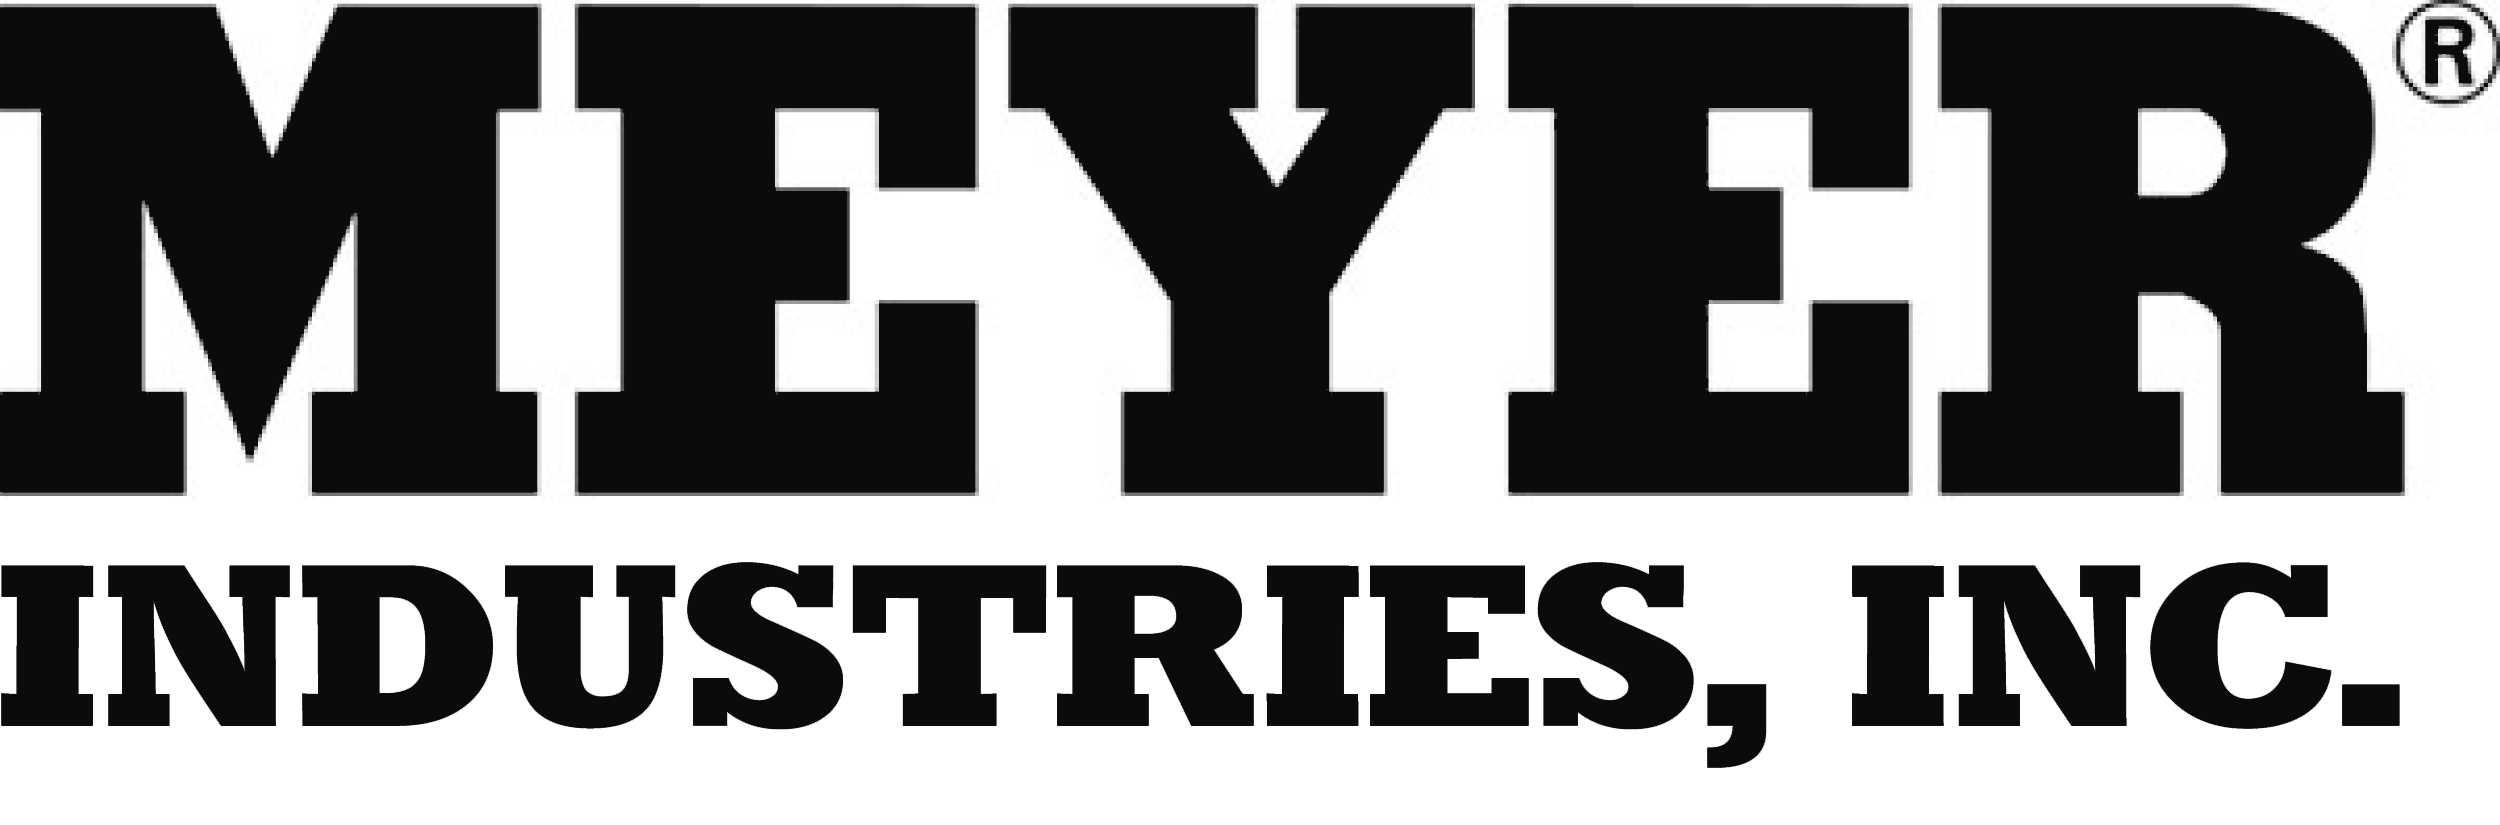 Meyer Industries logo large.jpg